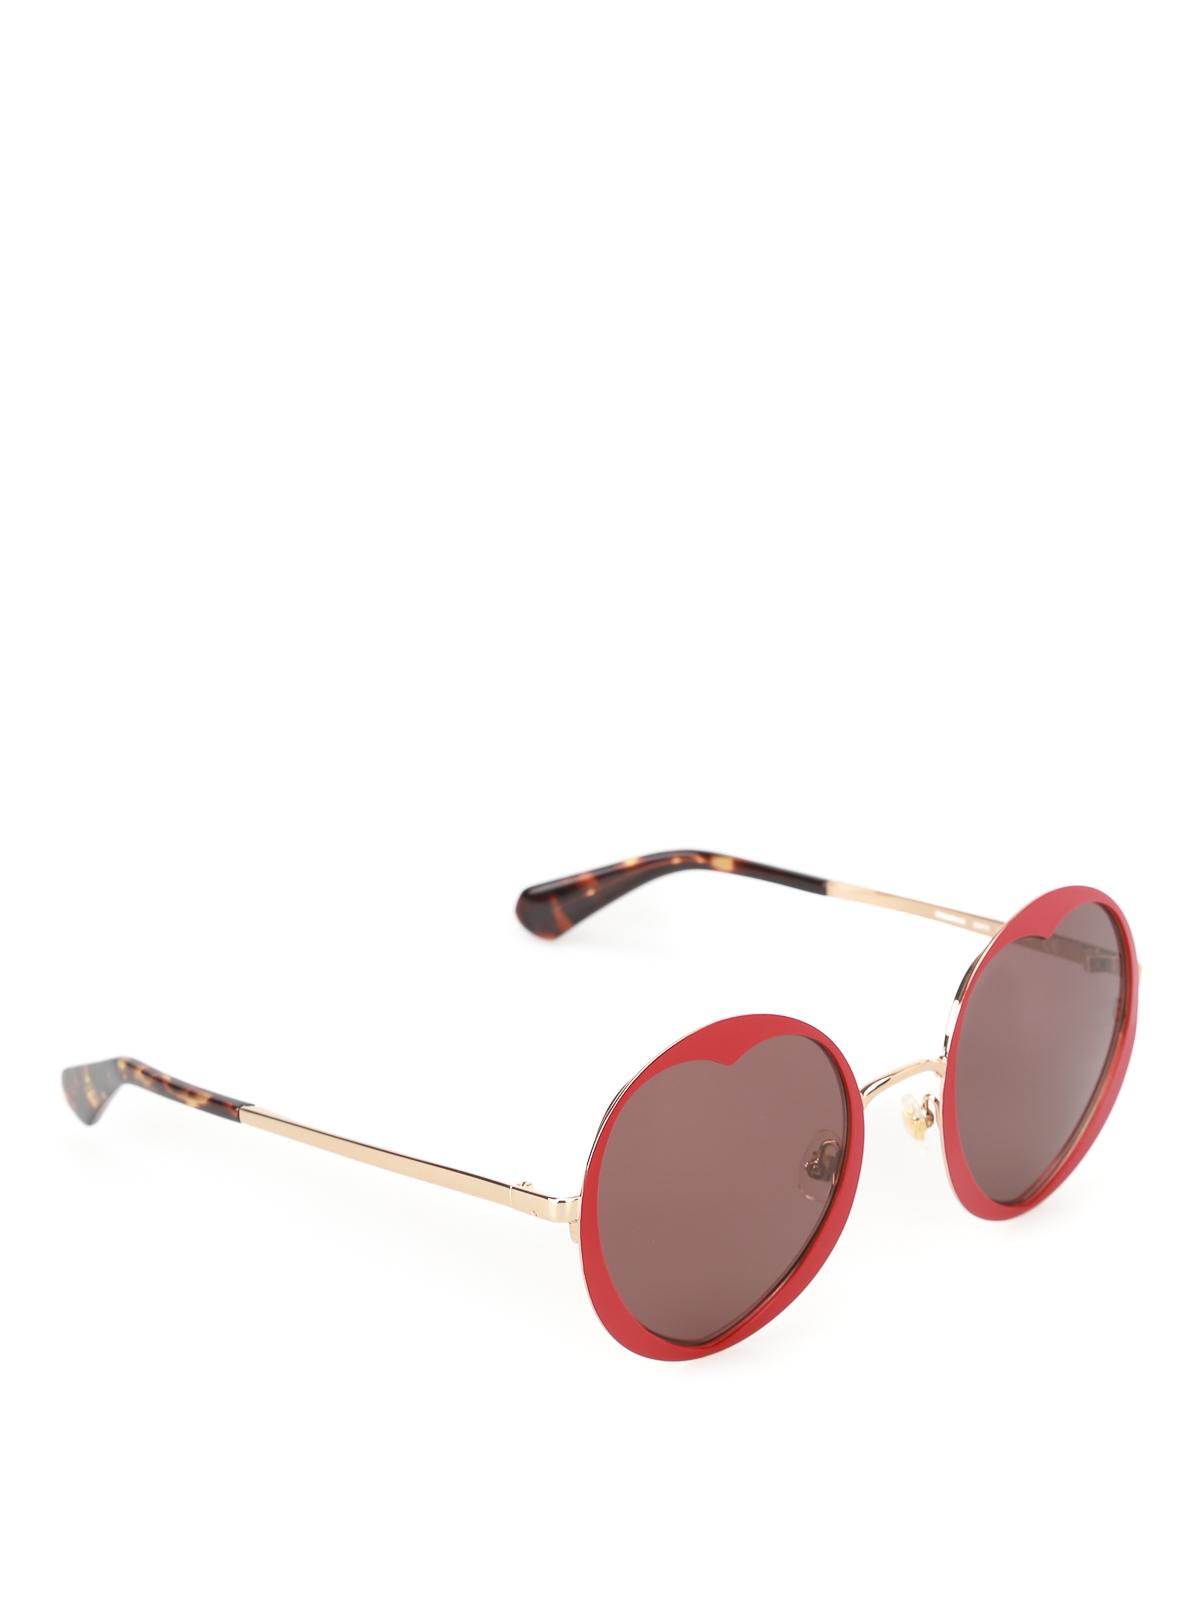 a809f7c10751 Kate Spade - Rosaria heart-shaped red sunglasses - sunglasses ...